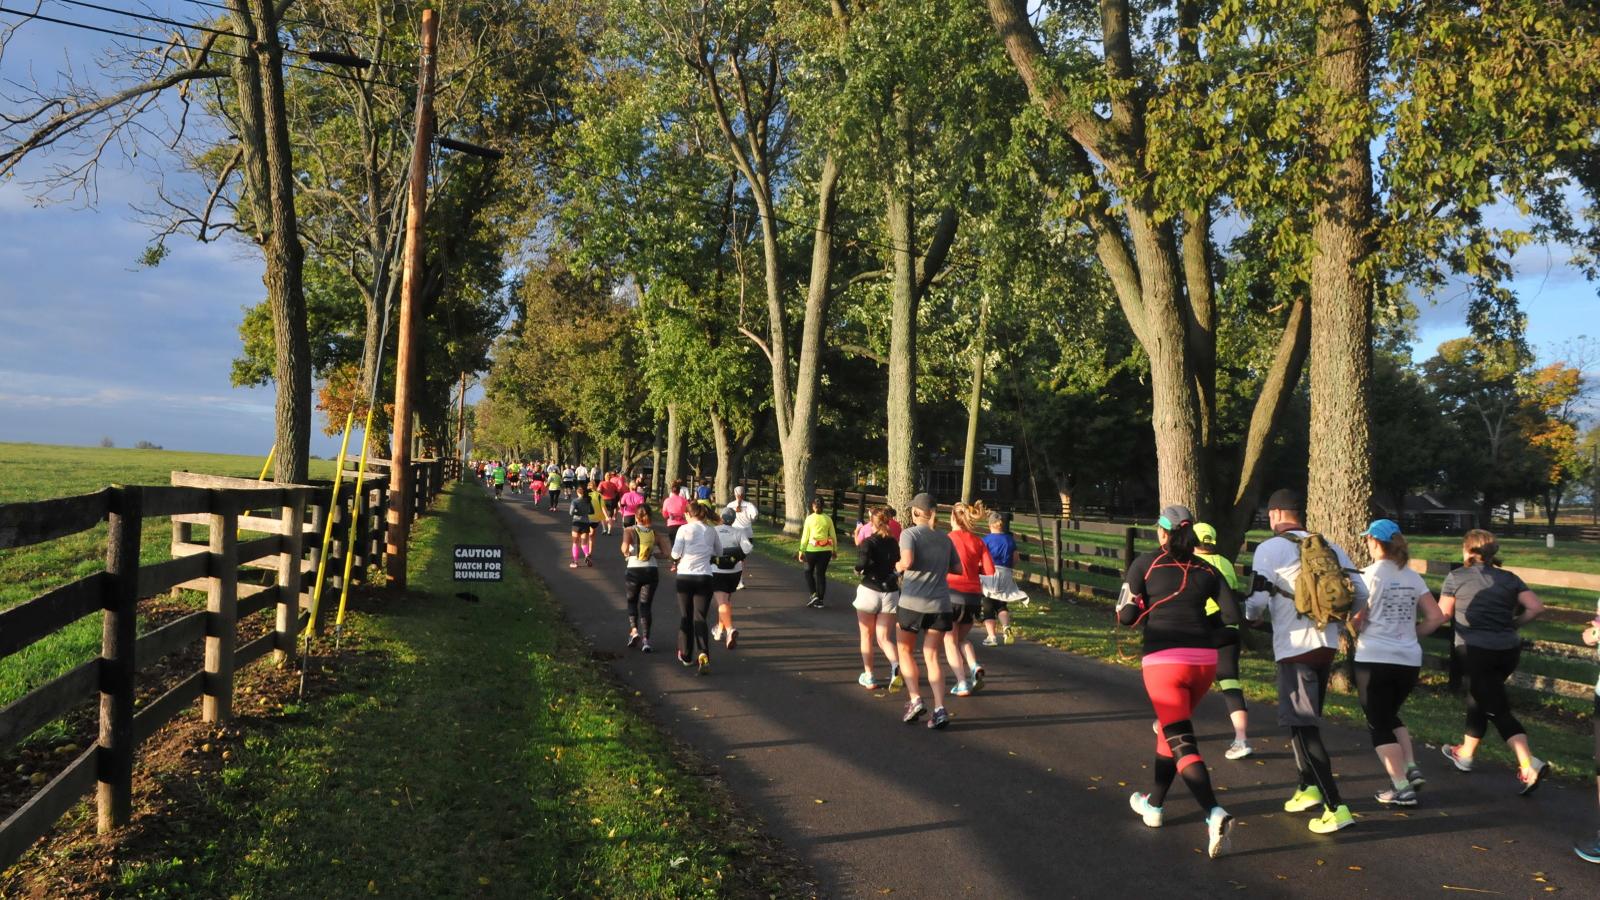 Looking for a Scenic Half Marathon? Run the Iron Horse! | Running on Happy